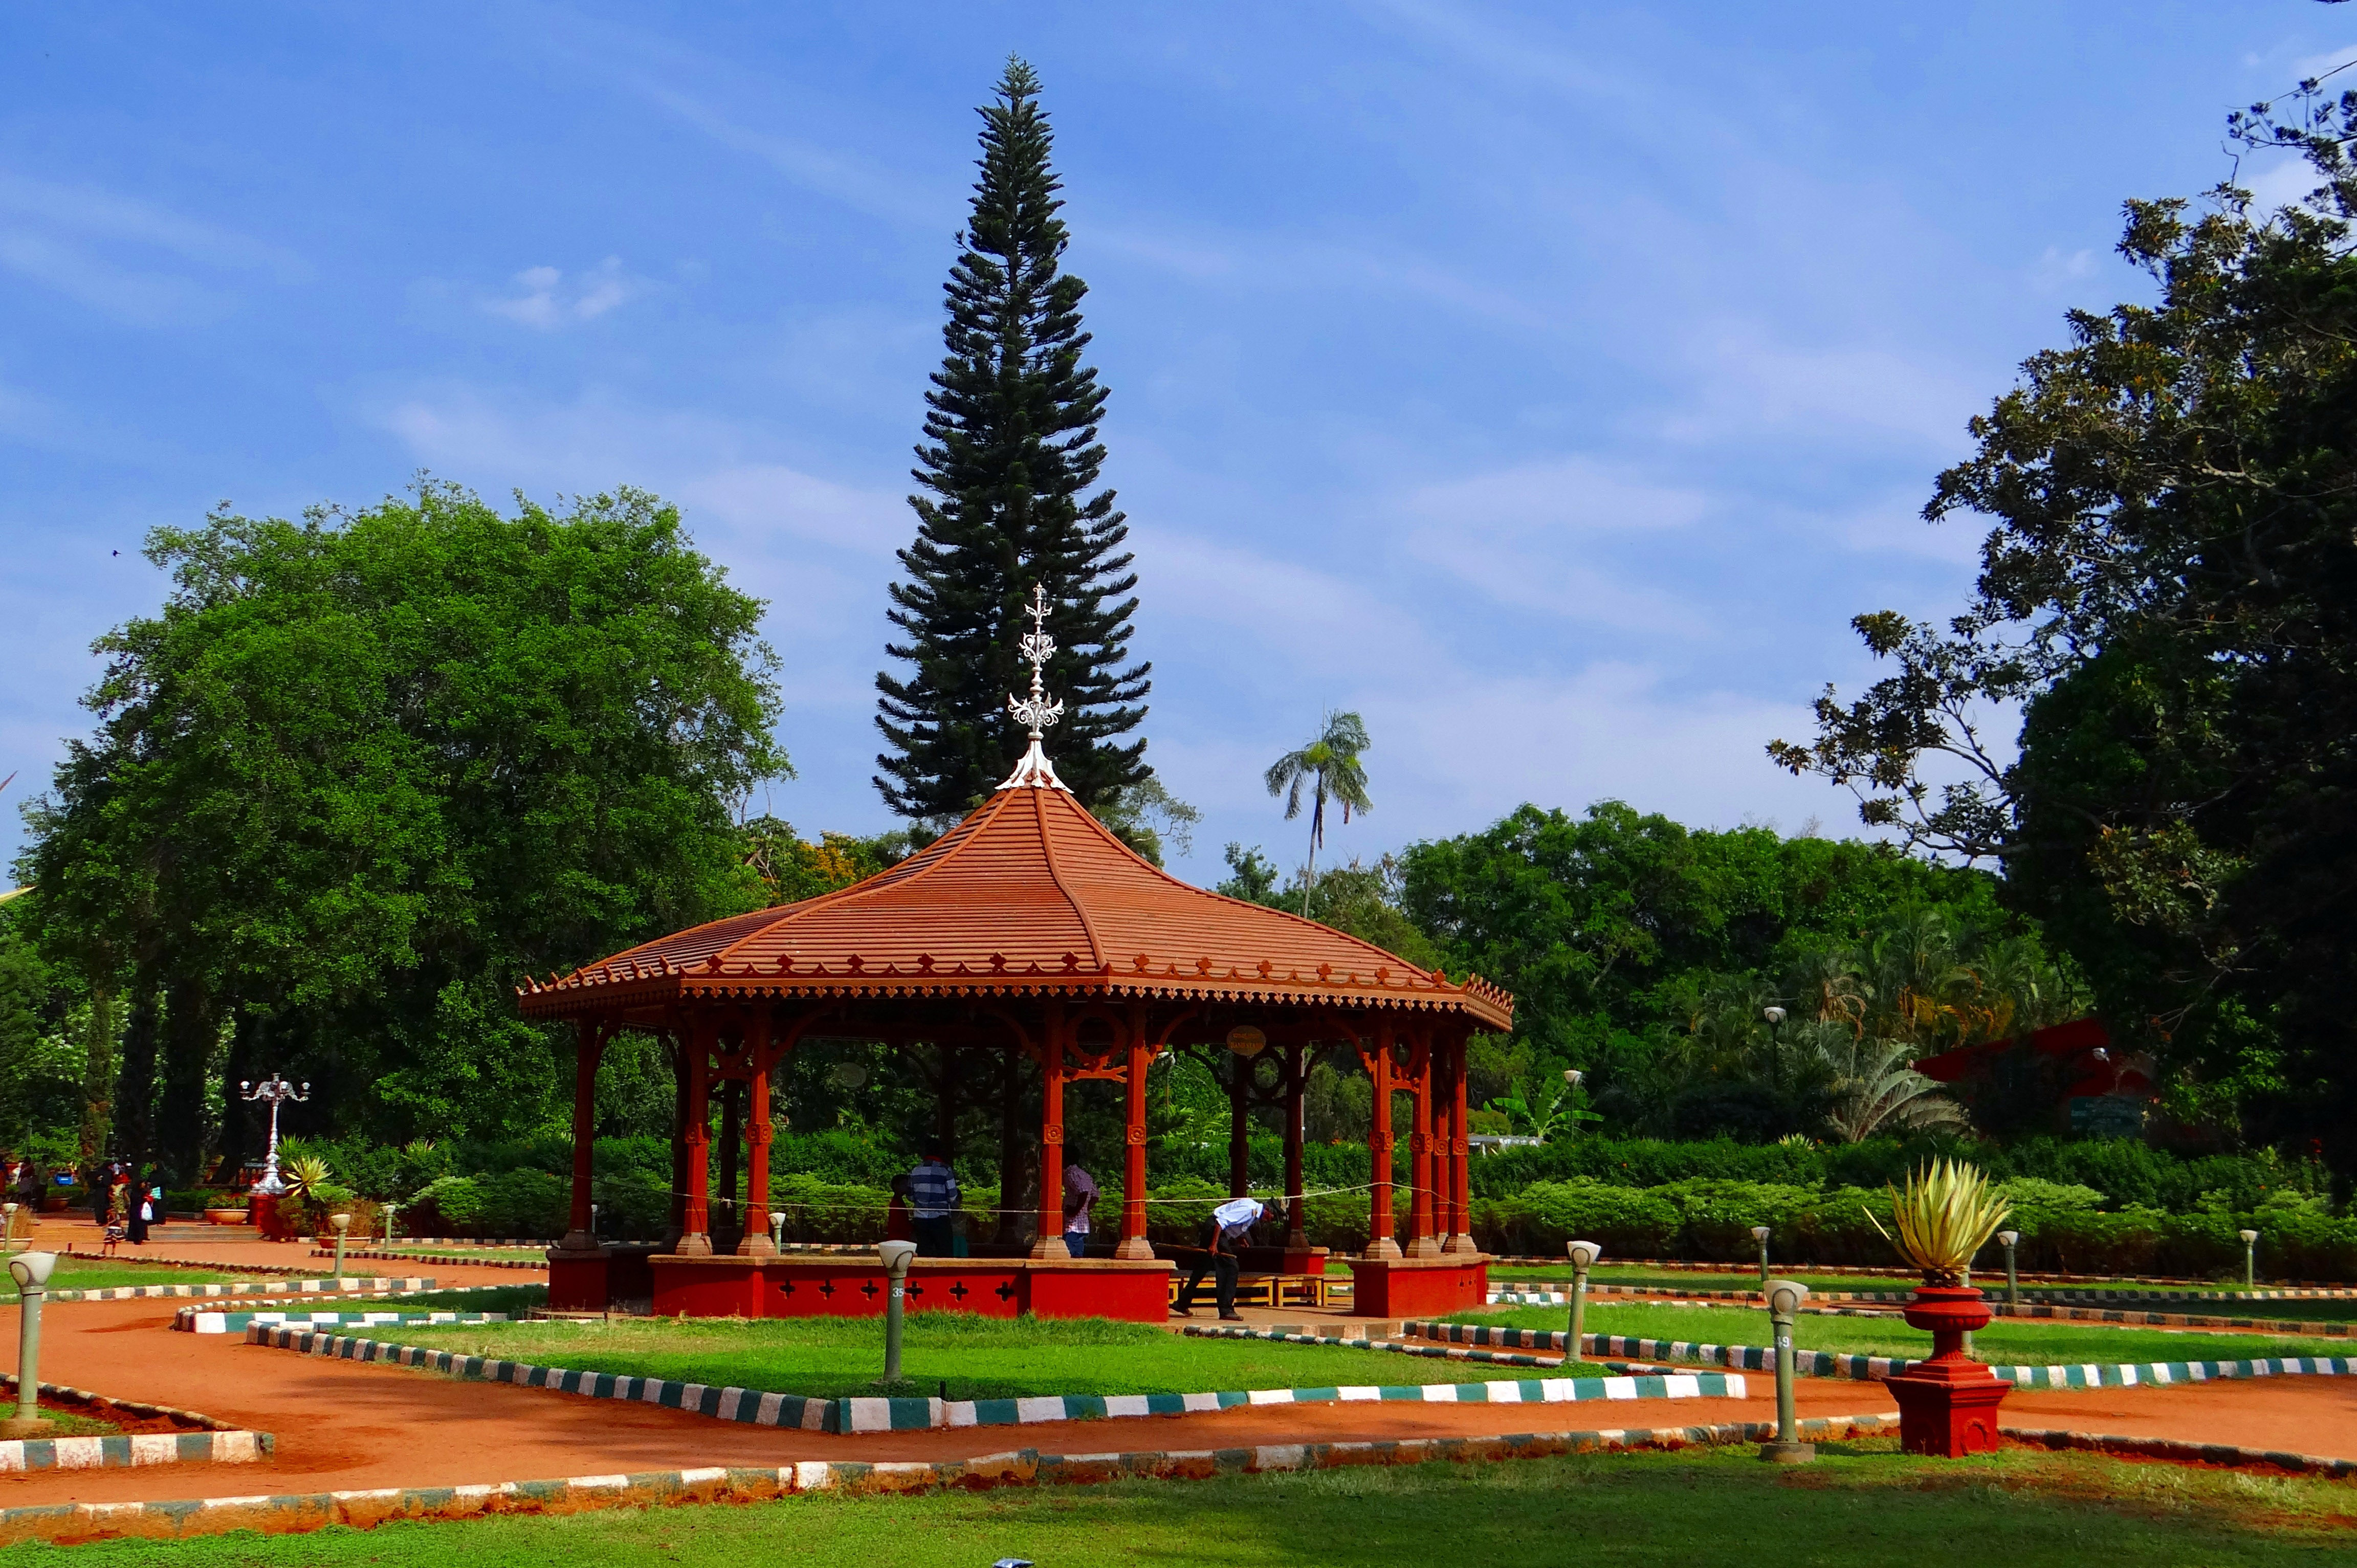 Gazebo in Canopy Garden in Bangalore, India image - Free ...